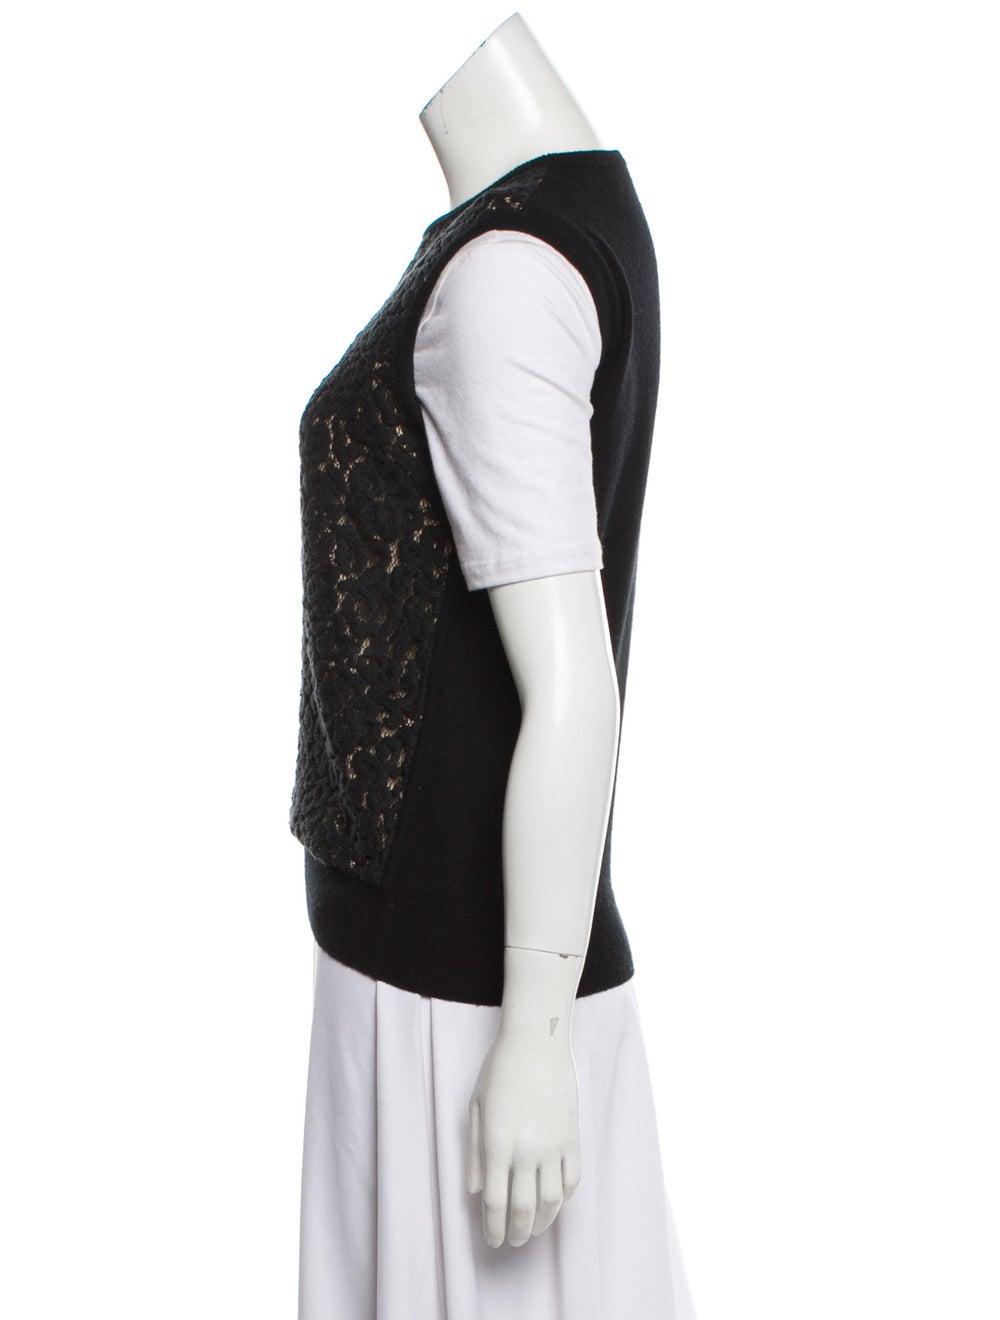 Chloé Wool & Cashmere-Blend Sweater Vest Black - image 2